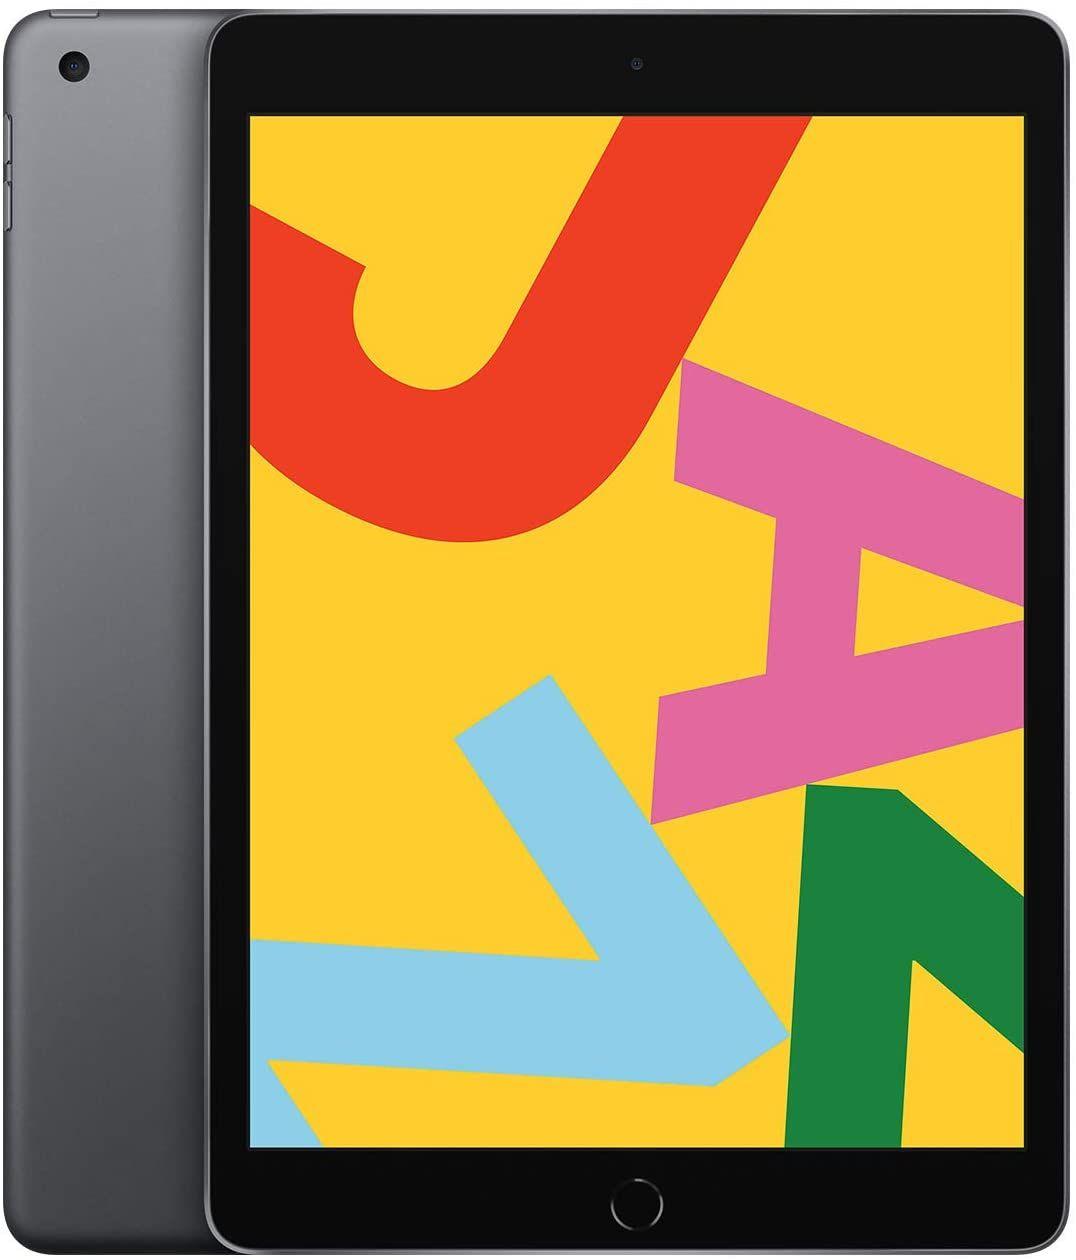 Apple Ipad 10 2 Inch Wi Fi 128gb Space Gray Latest Model In 2020 New Apple Ipad Apple Ipad Apple Ipad Mini